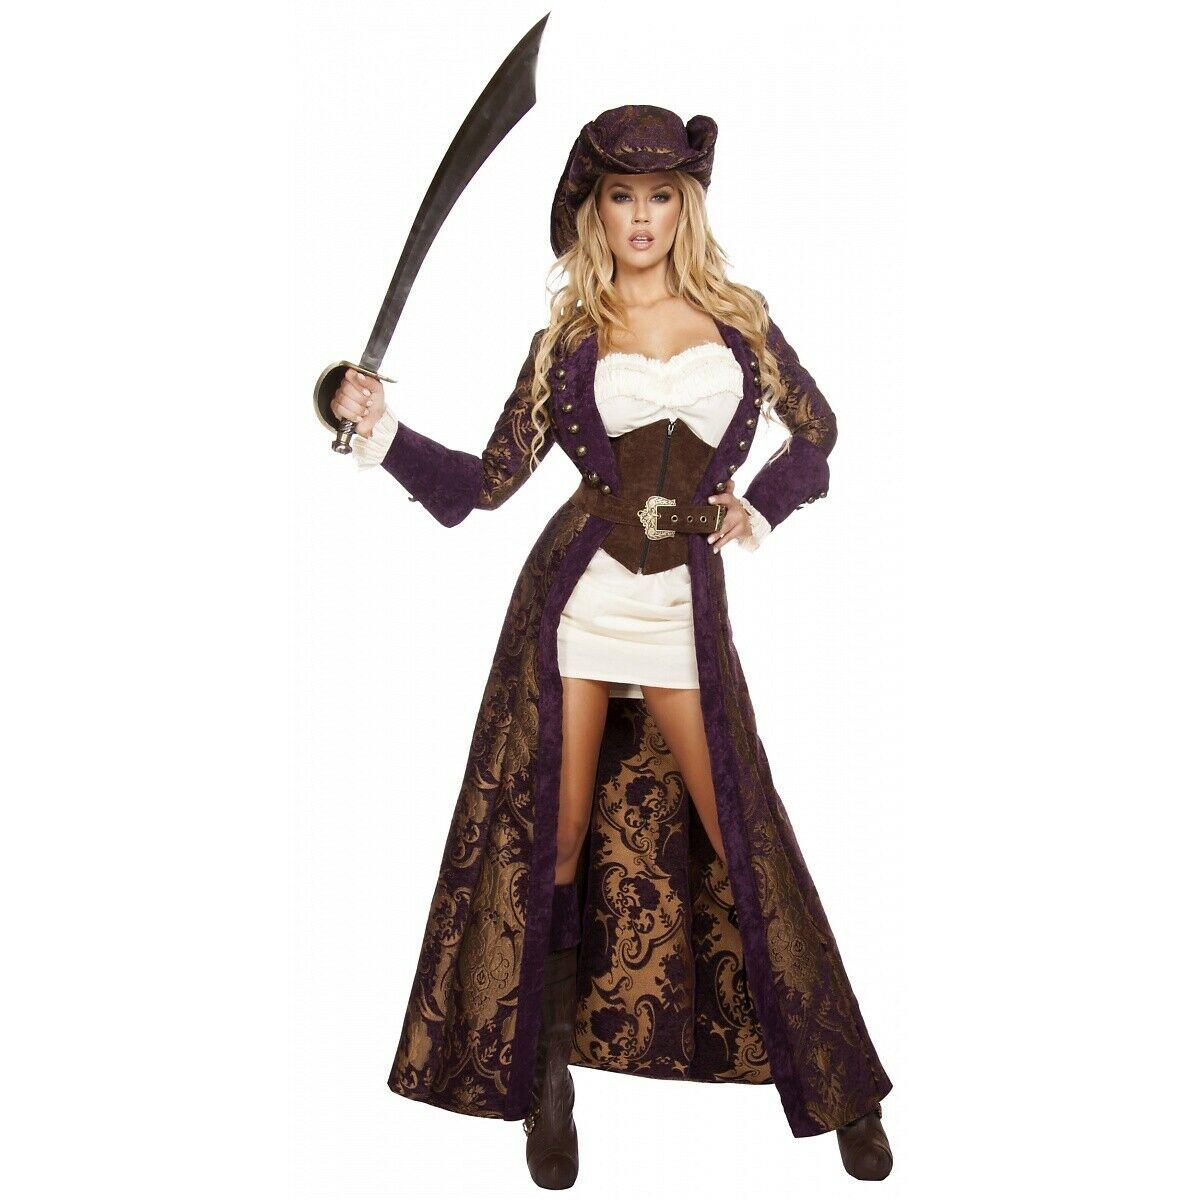 Woman Pirate Halloween Costume